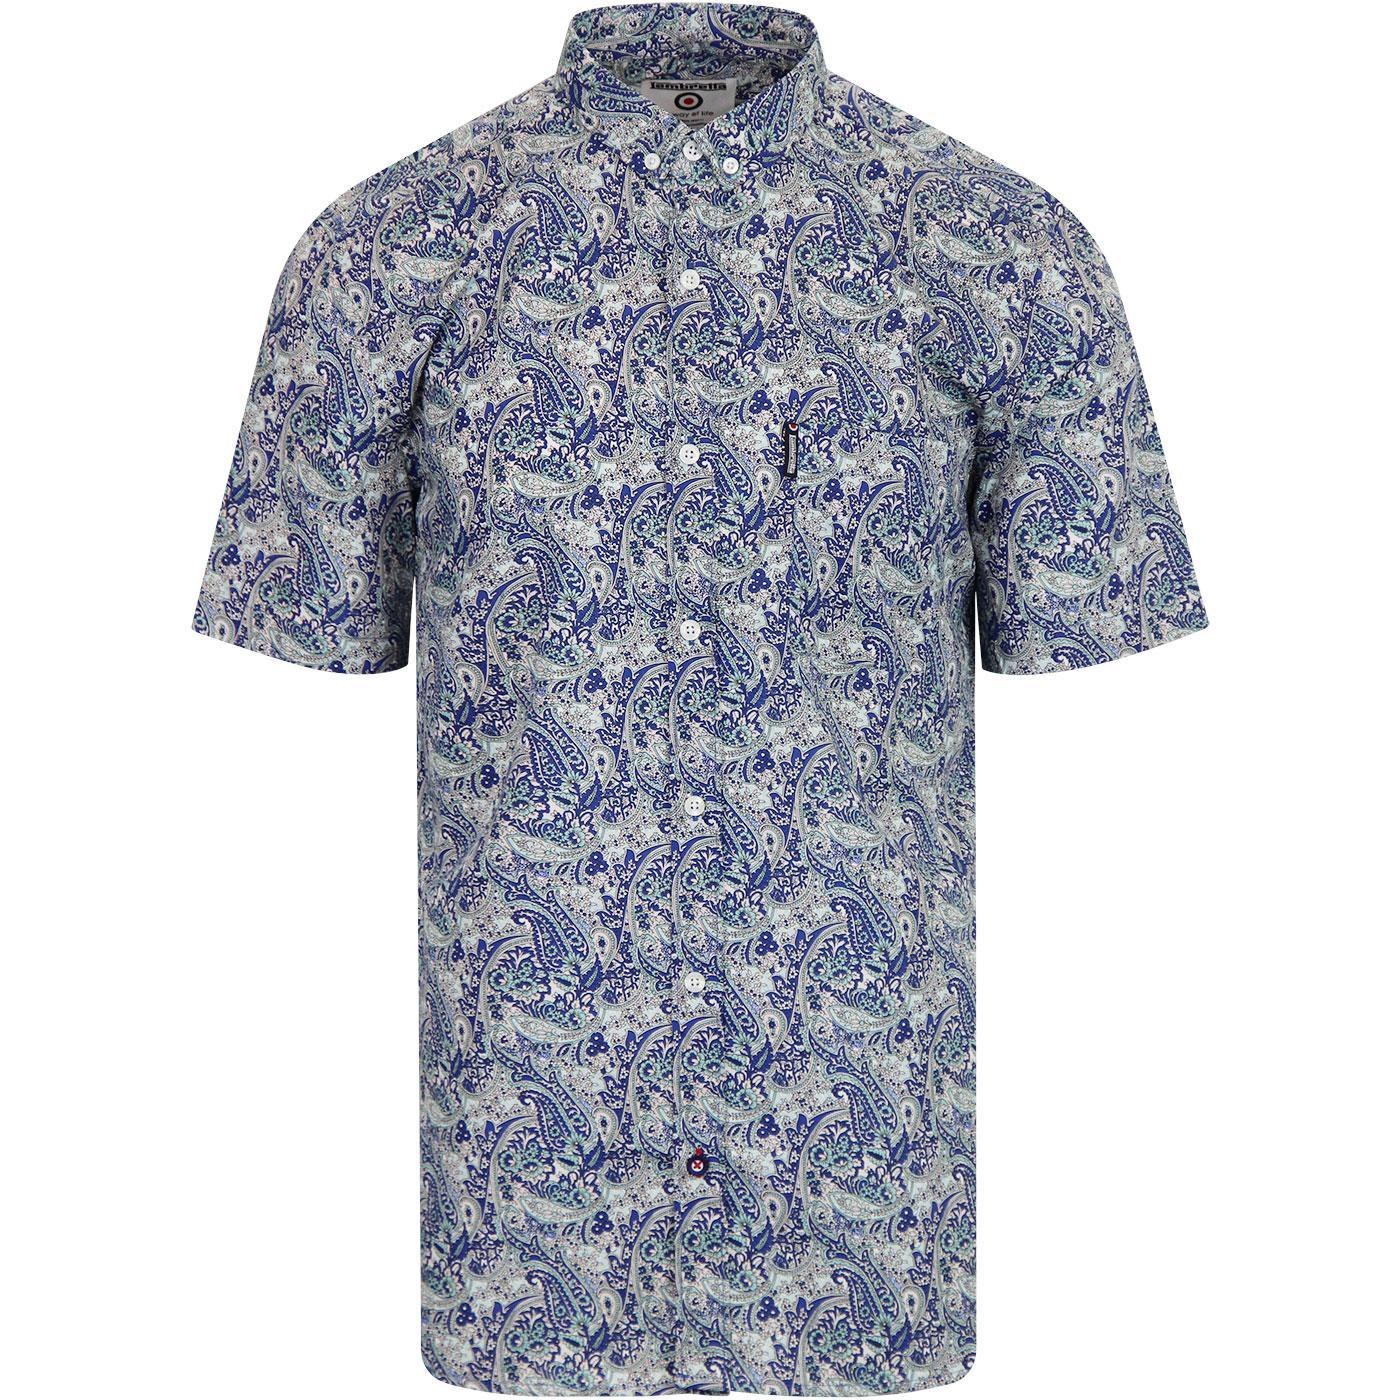 LAMBRETTA Retro S/S Paisley Printed Mod Shirt BLUE